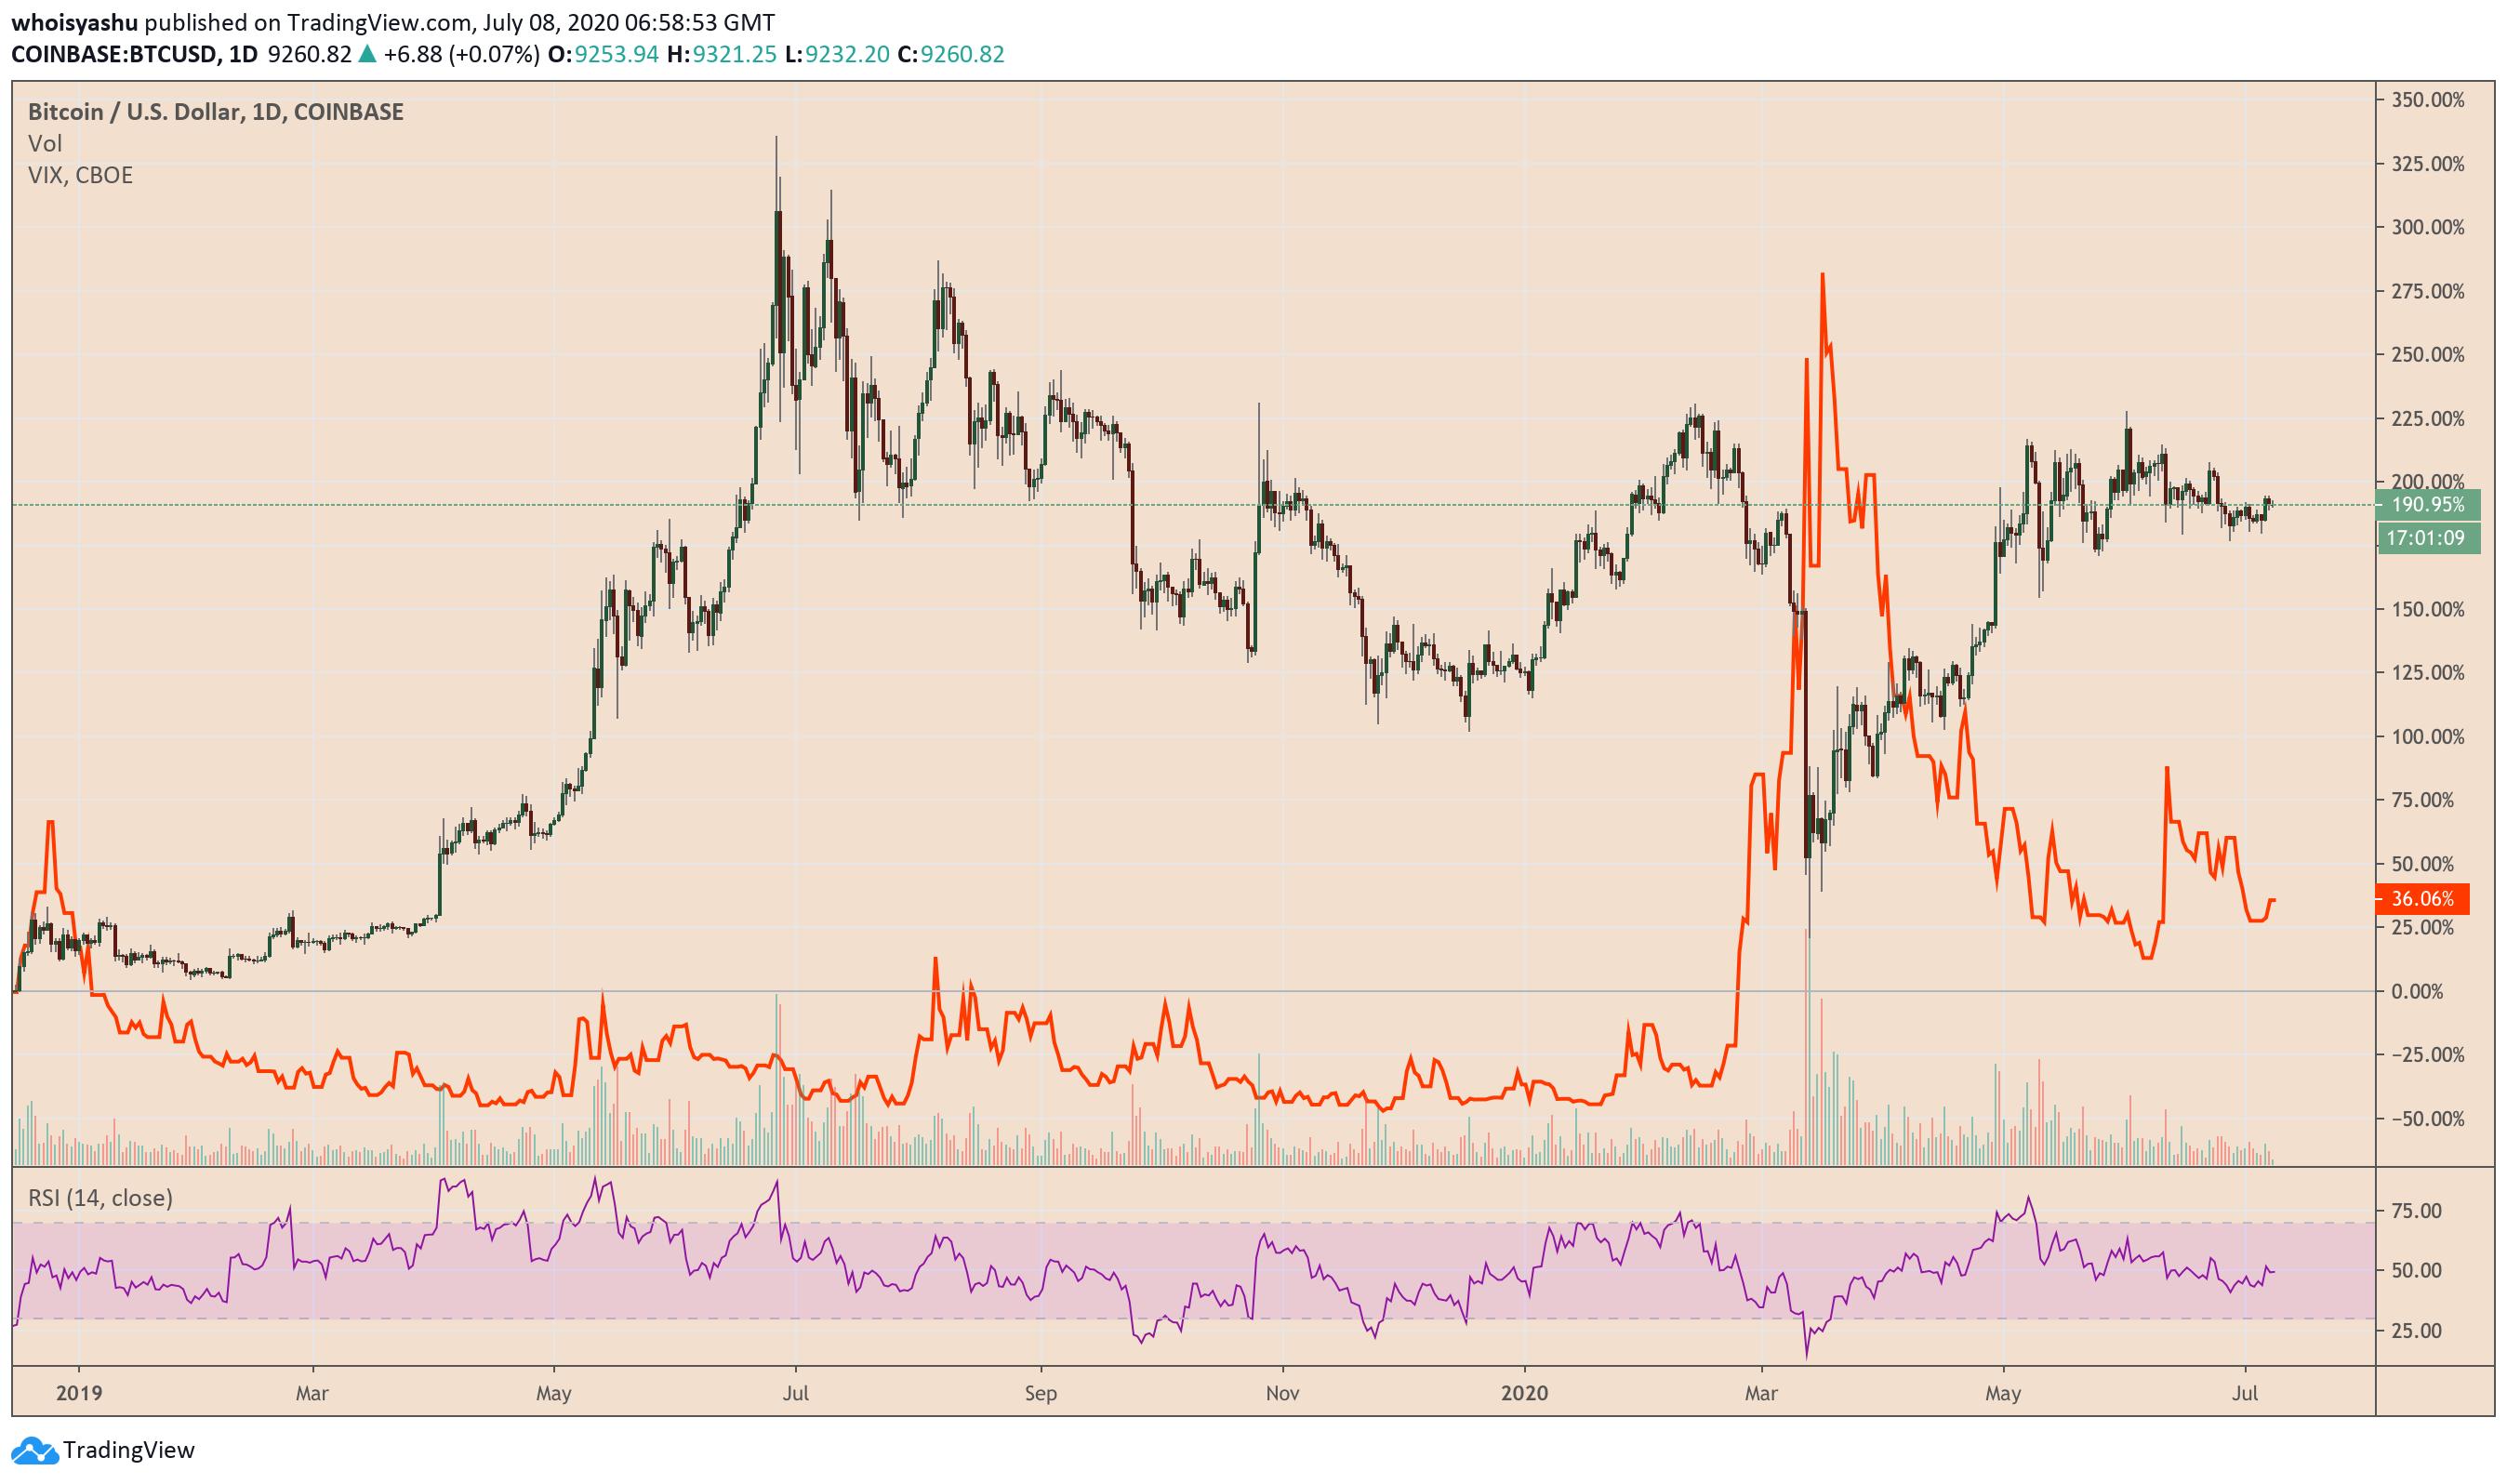 bitcoin price 08072020 1